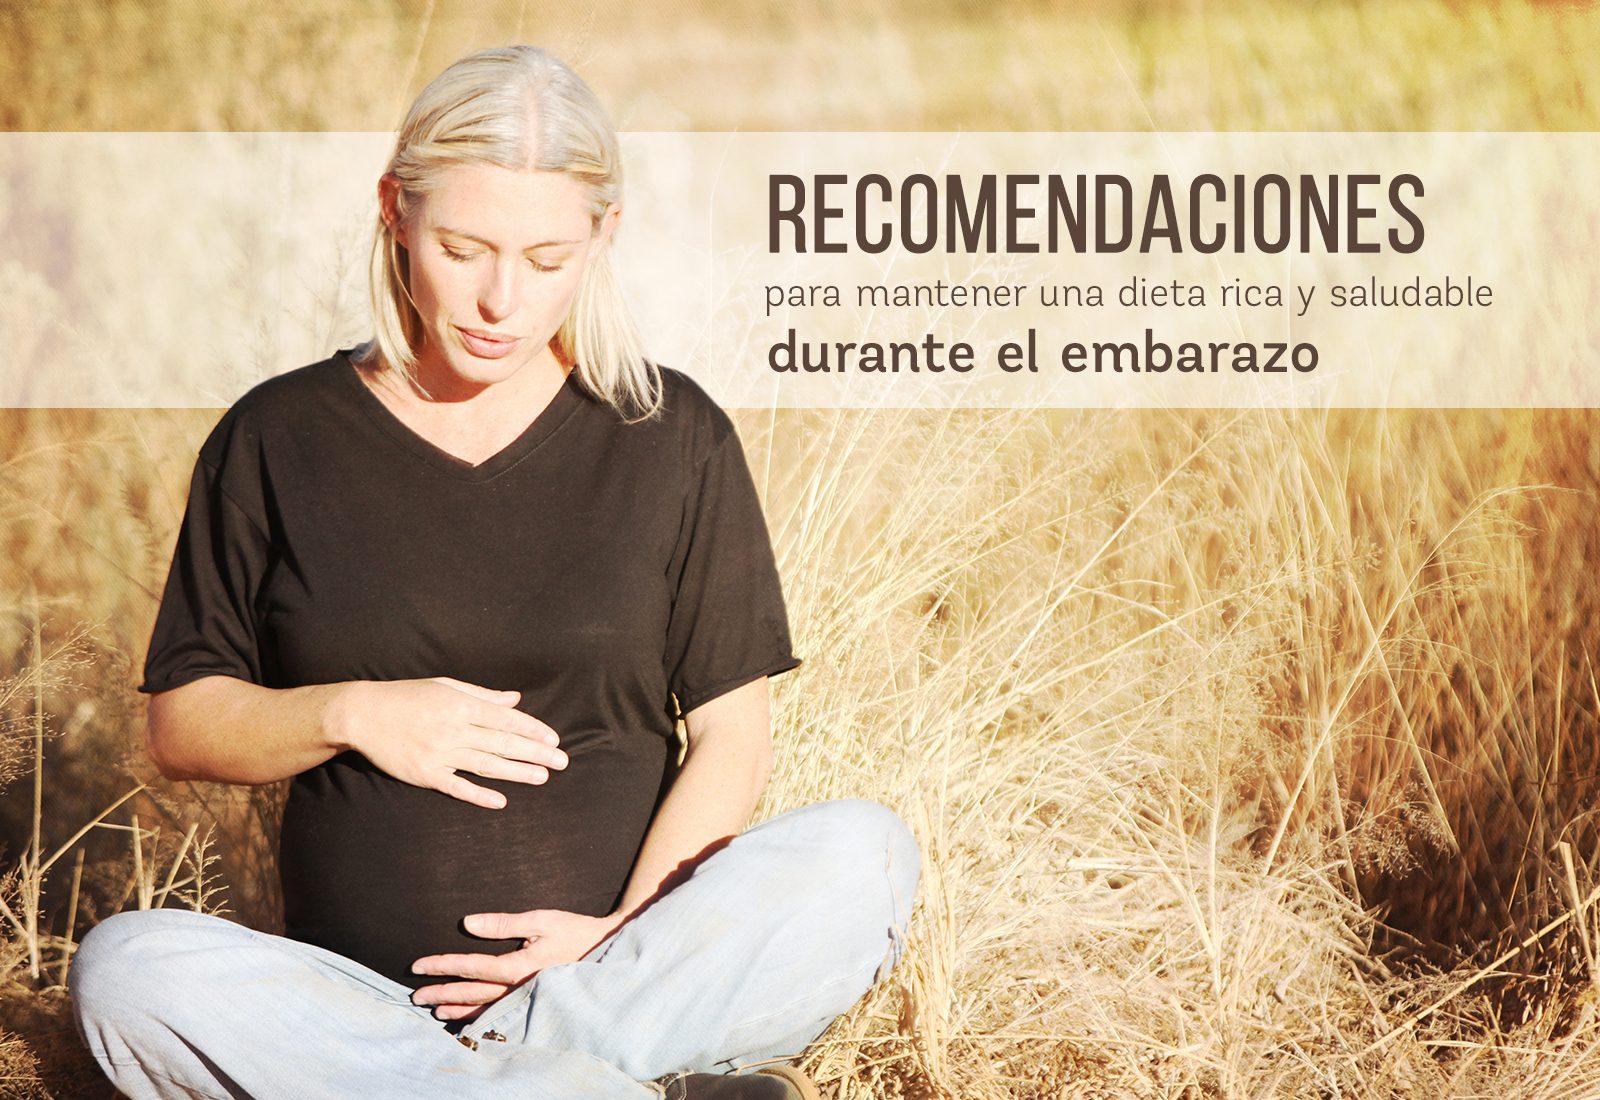 Recomendaciones dieta saludable durante embarazo